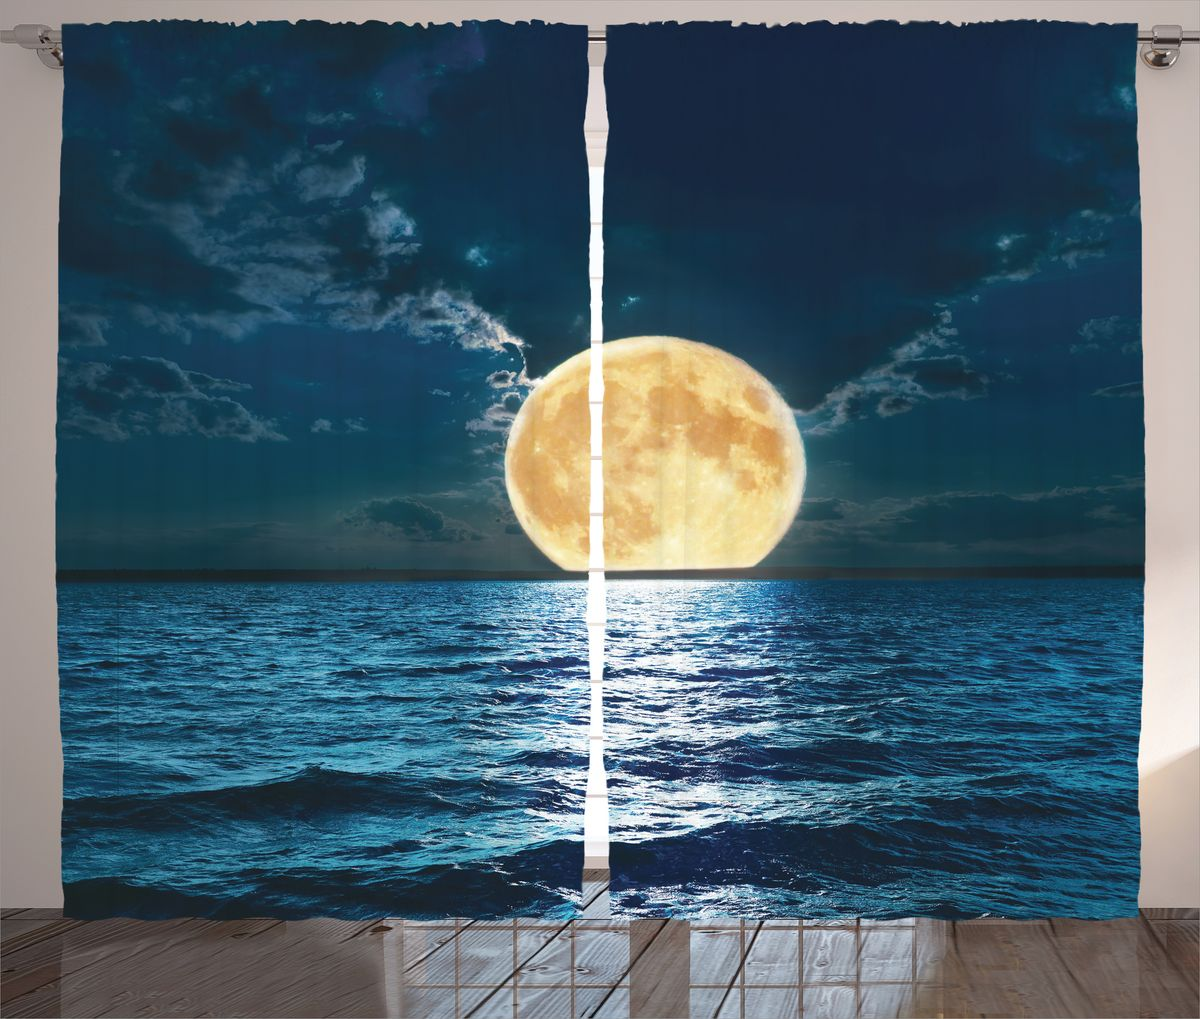 Комплект фотоштор Magic Lady Луна над бирюзовым морем, на ленте, высота 265 см. шсг_15018